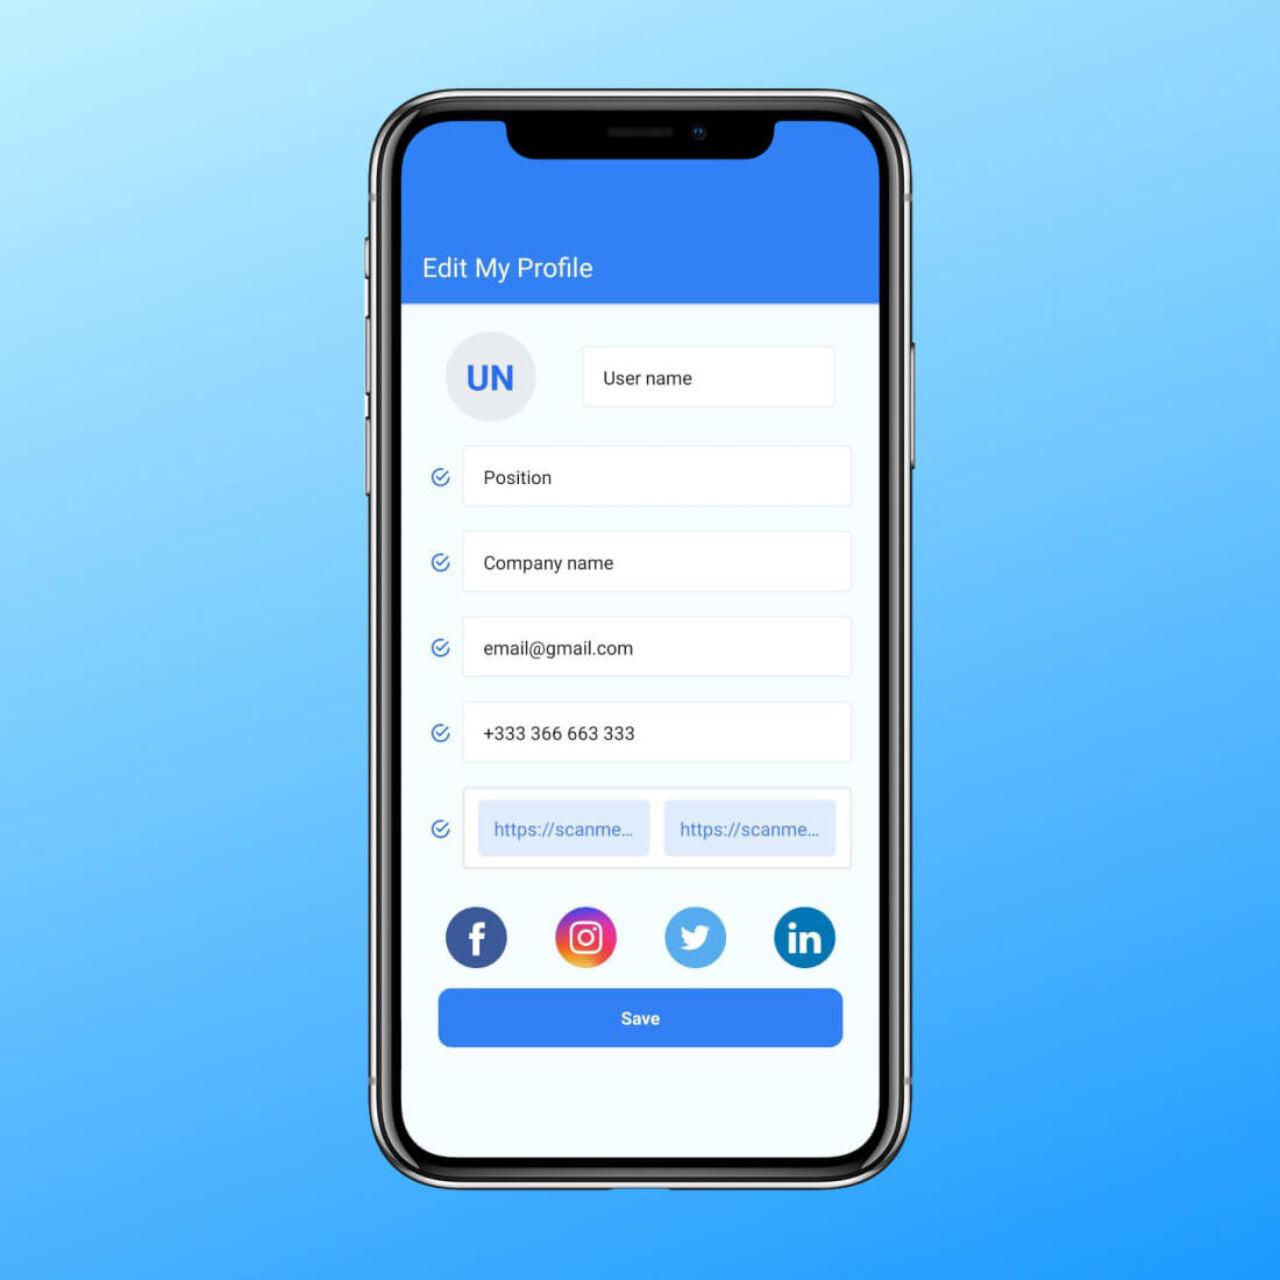 Business card scanner app - Profile